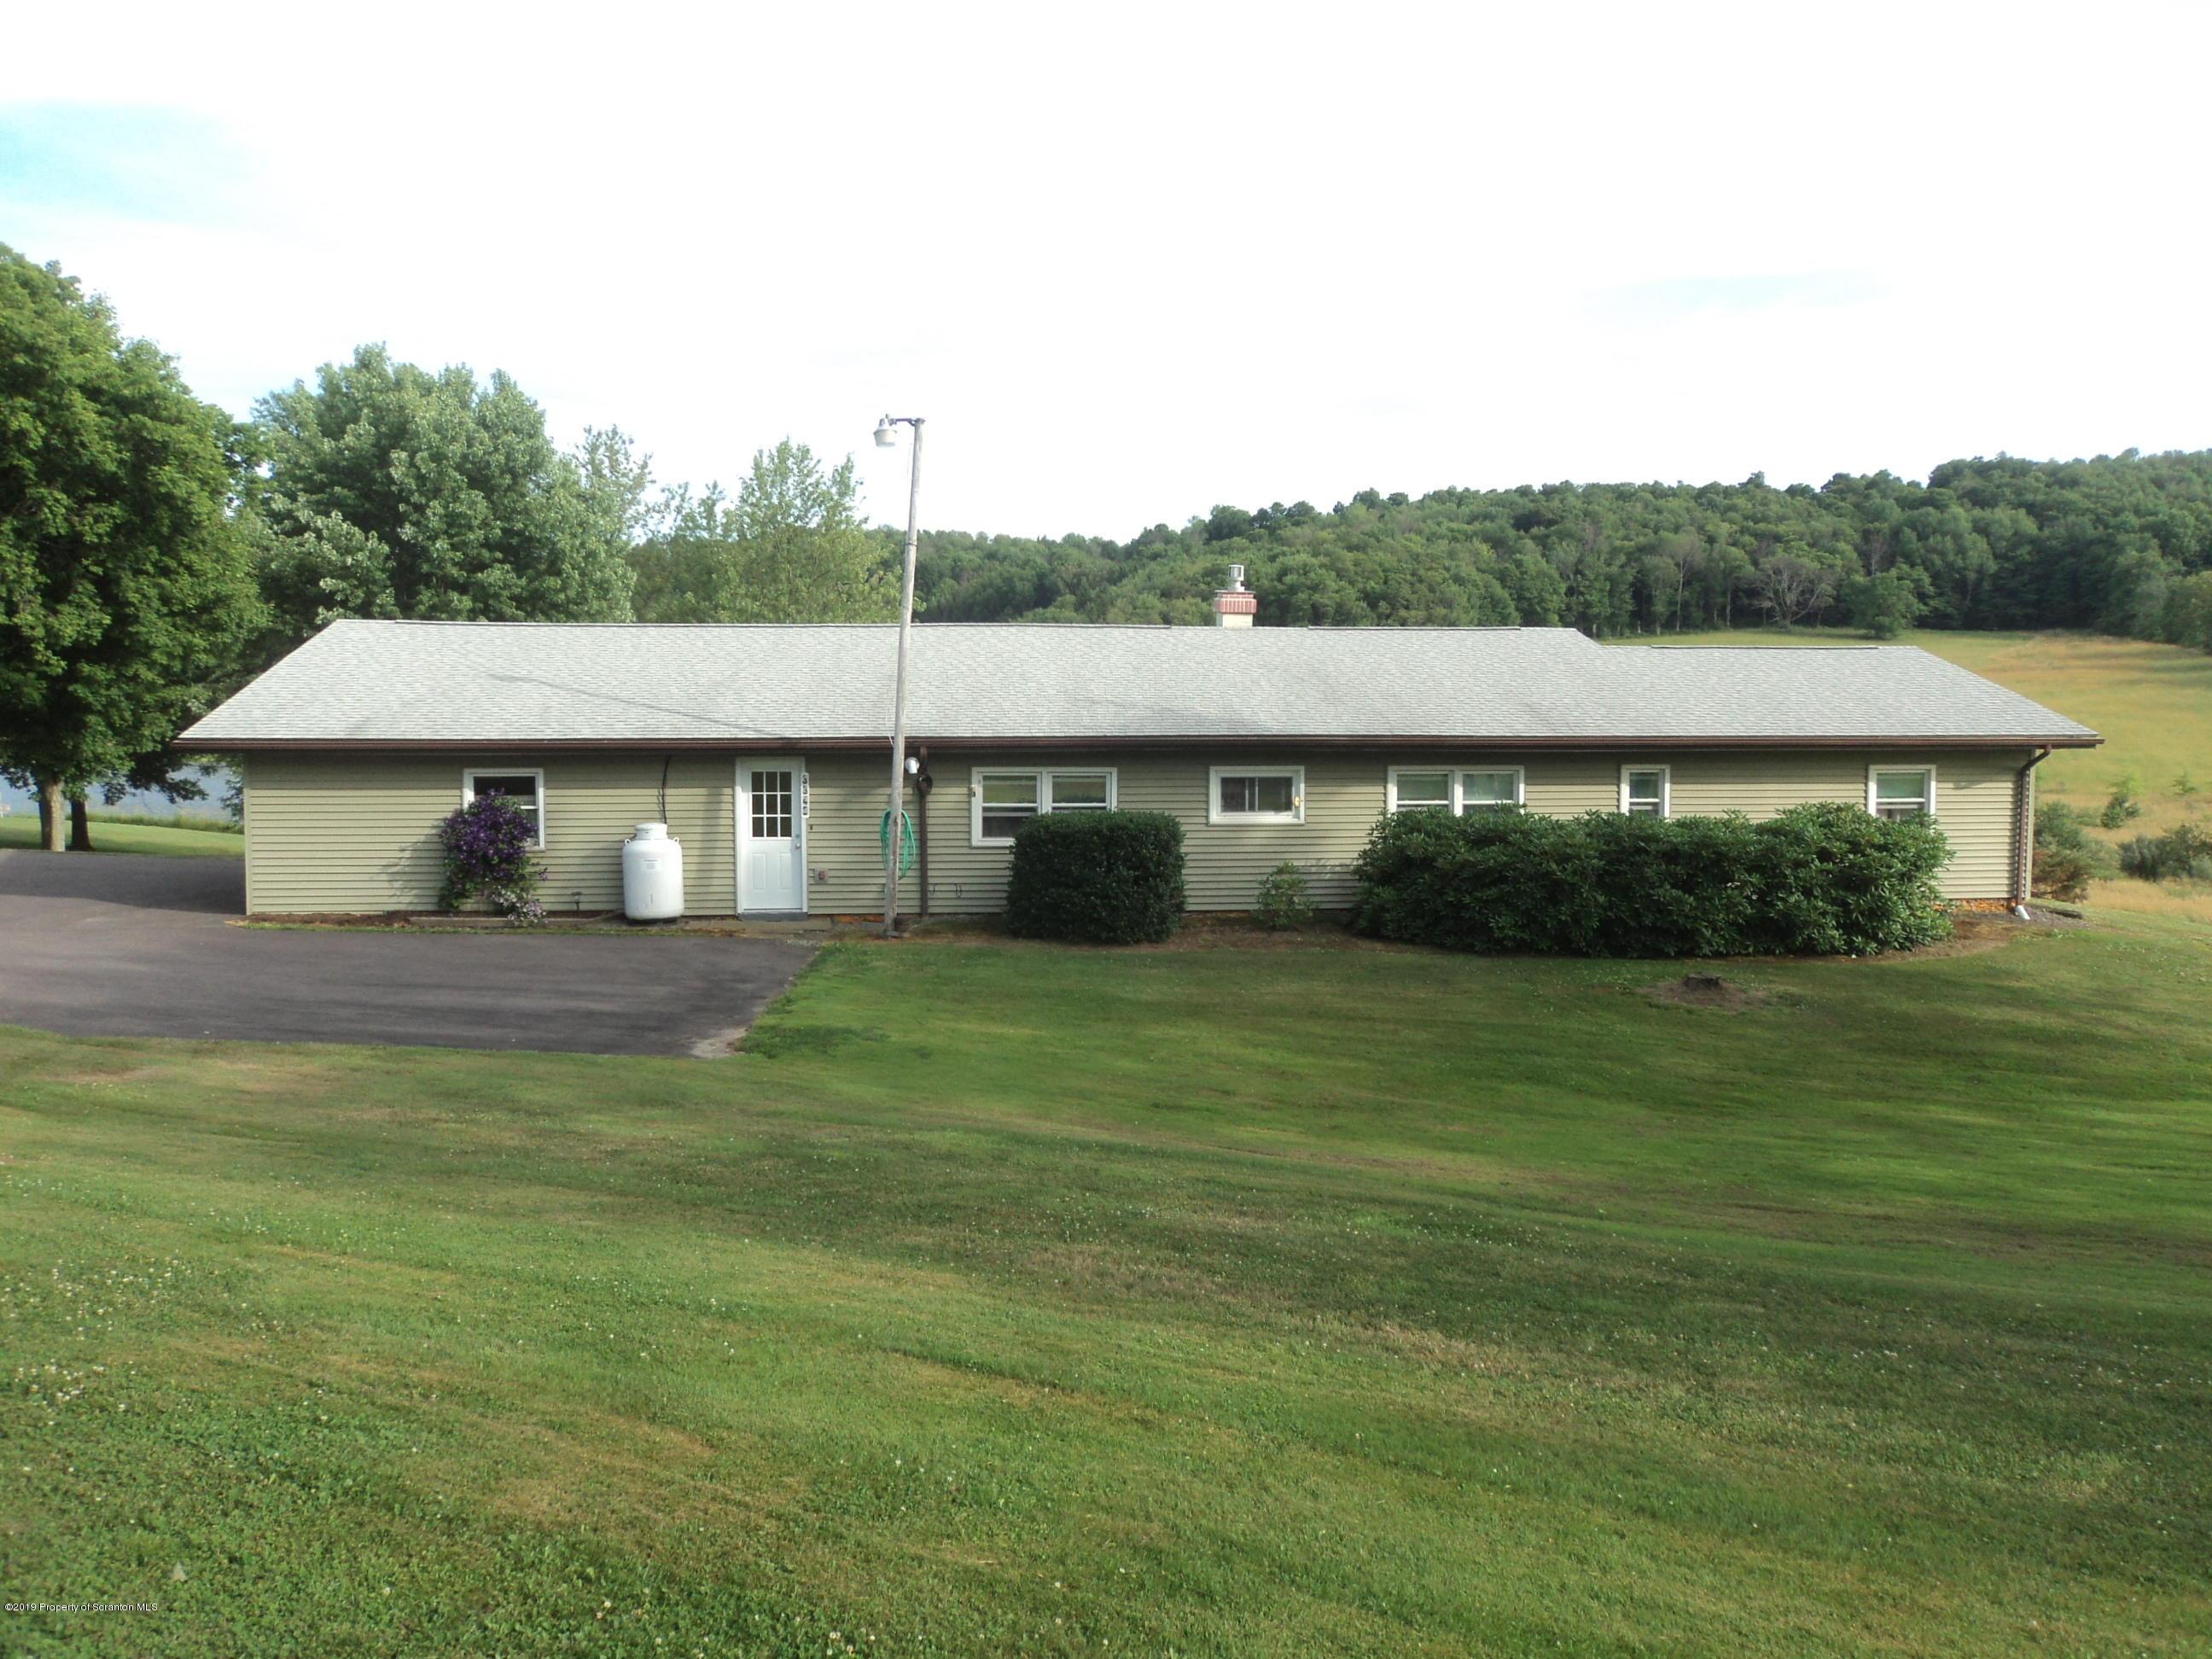 3349 Ridge Road, Montrose, Pennsylvania 18801, 3 Bedrooms Bedrooms, 7 Rooms Rooms,2 BathroomsBathrooms,Single Family,For Sale,Ridge Road,19-3370